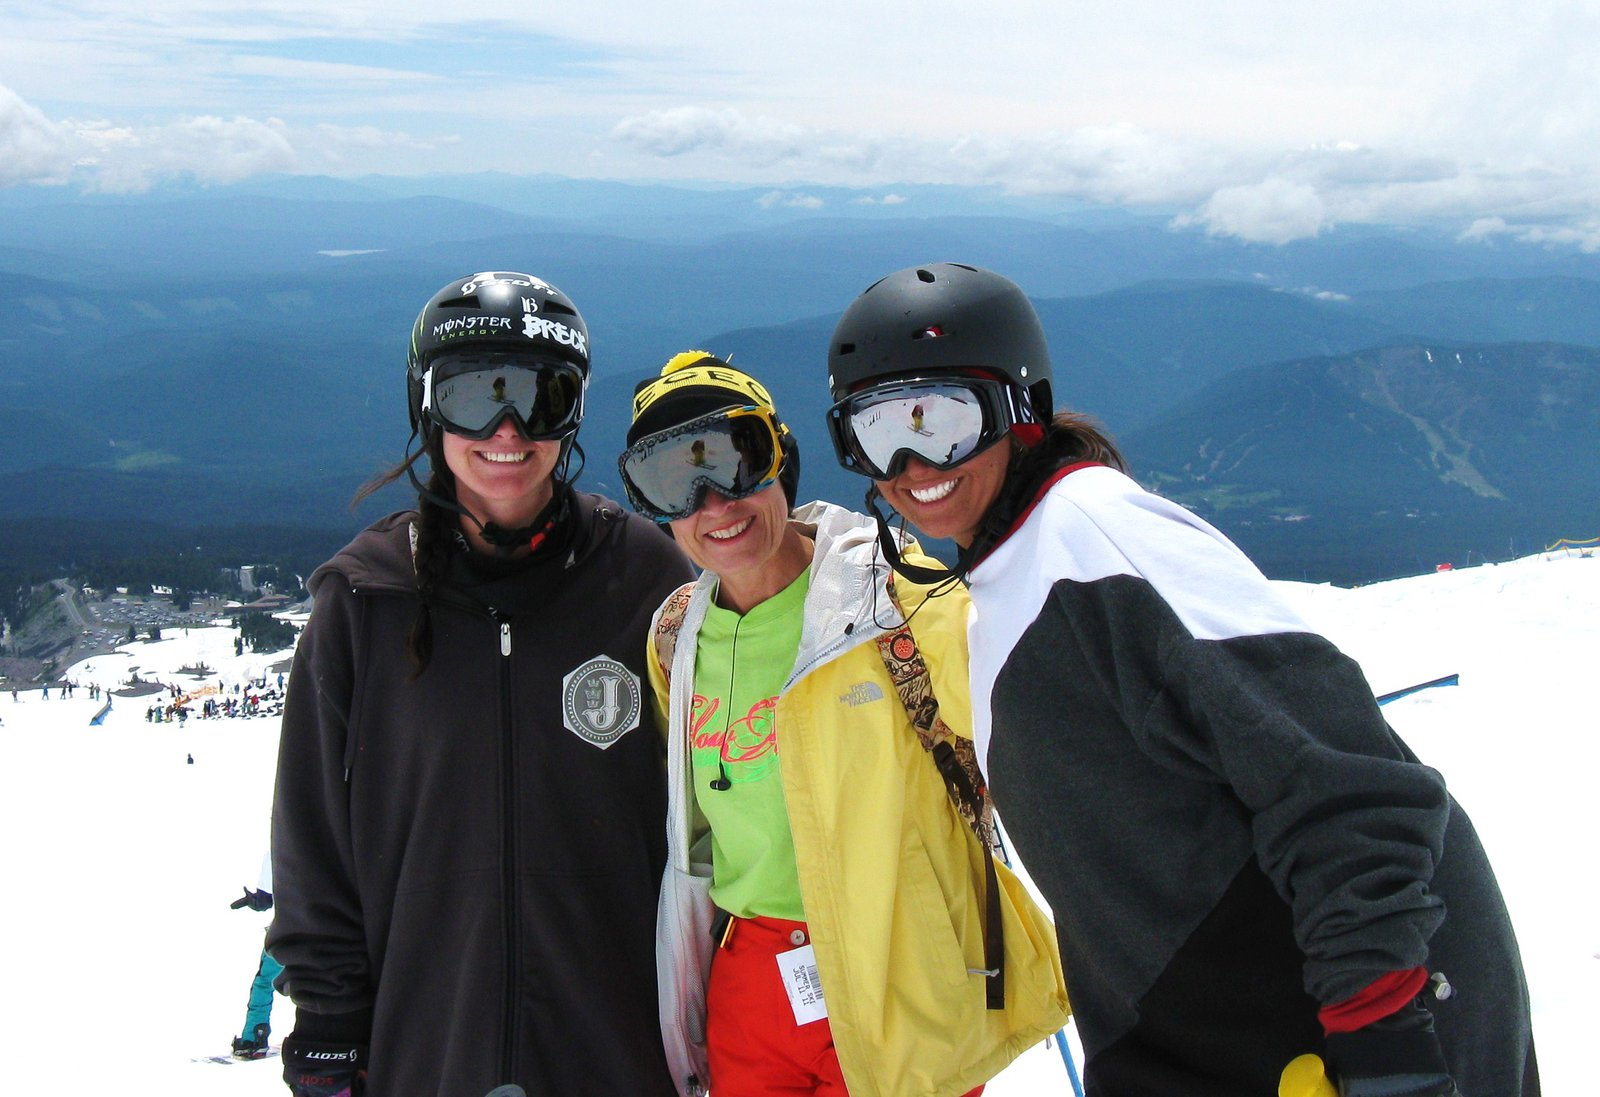 Keri Herman, me and Ashley Battersby!